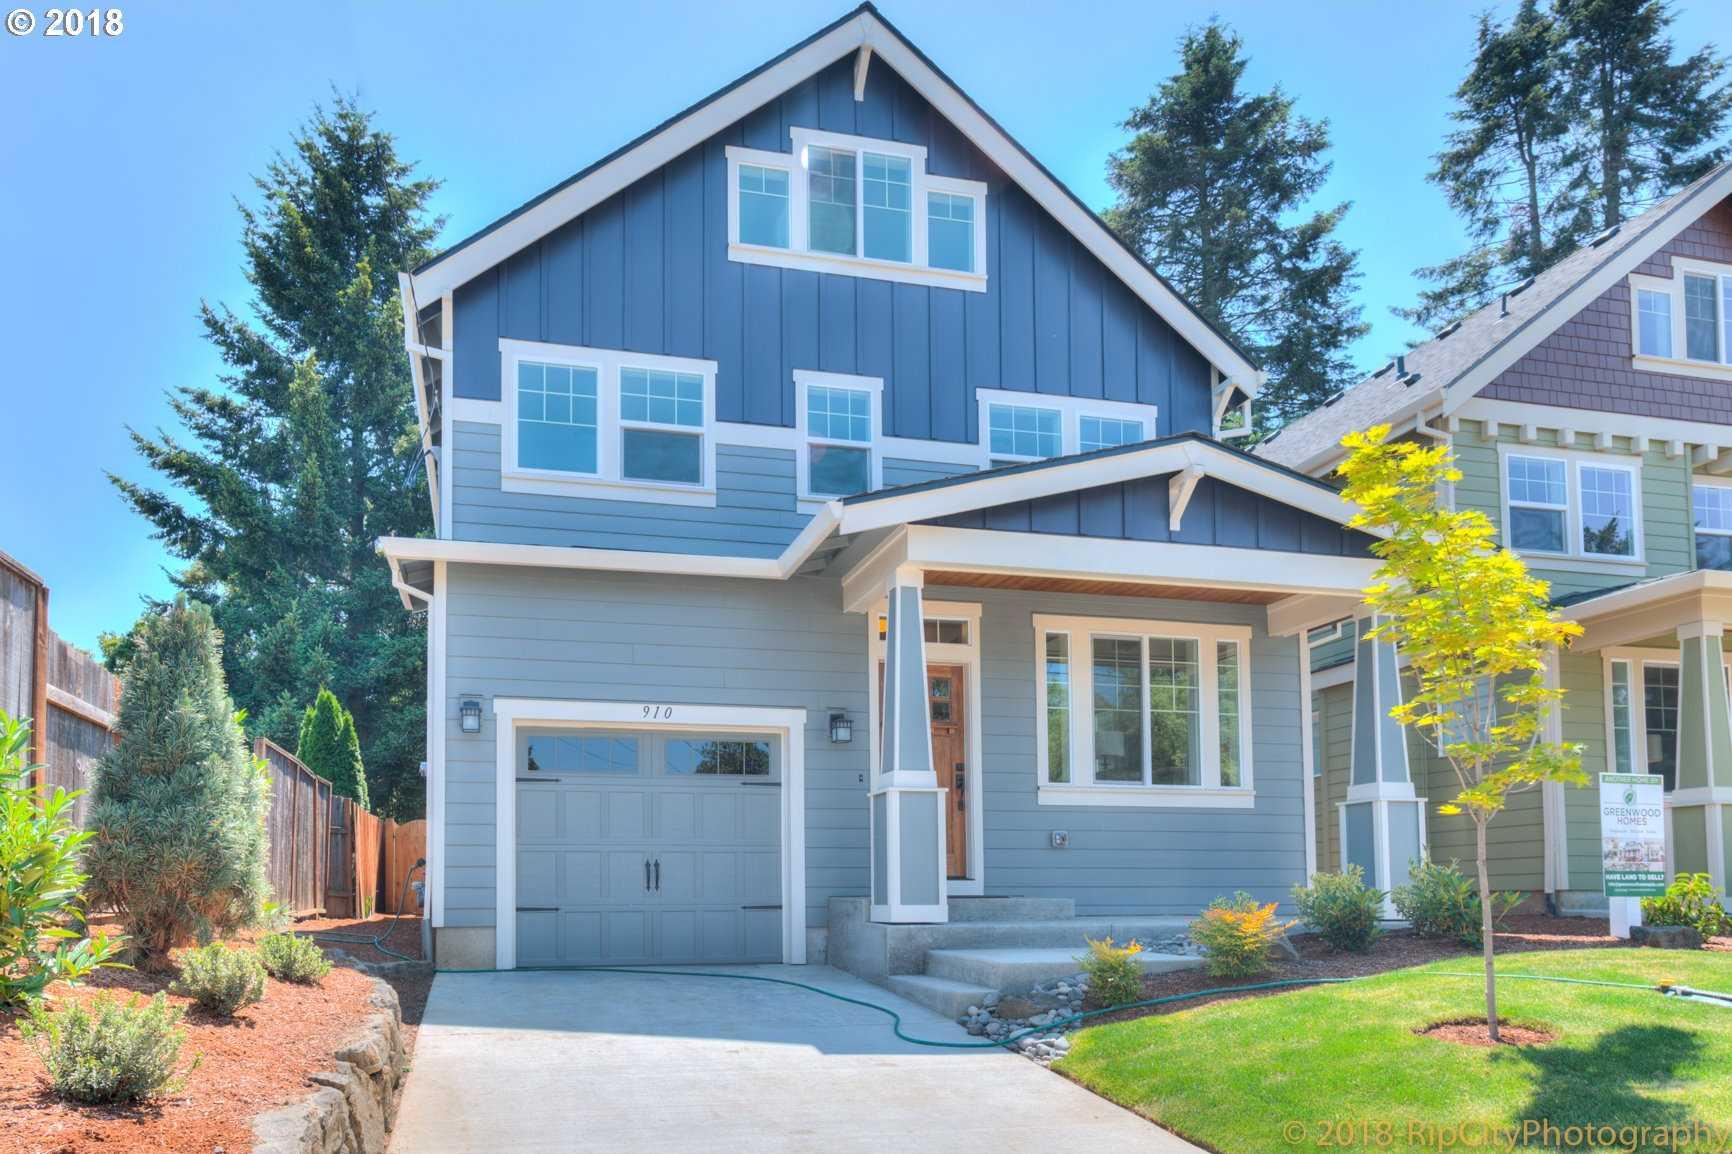 $549,950 - 3Br/3Ba -  for Sale in Piedmont, Portland